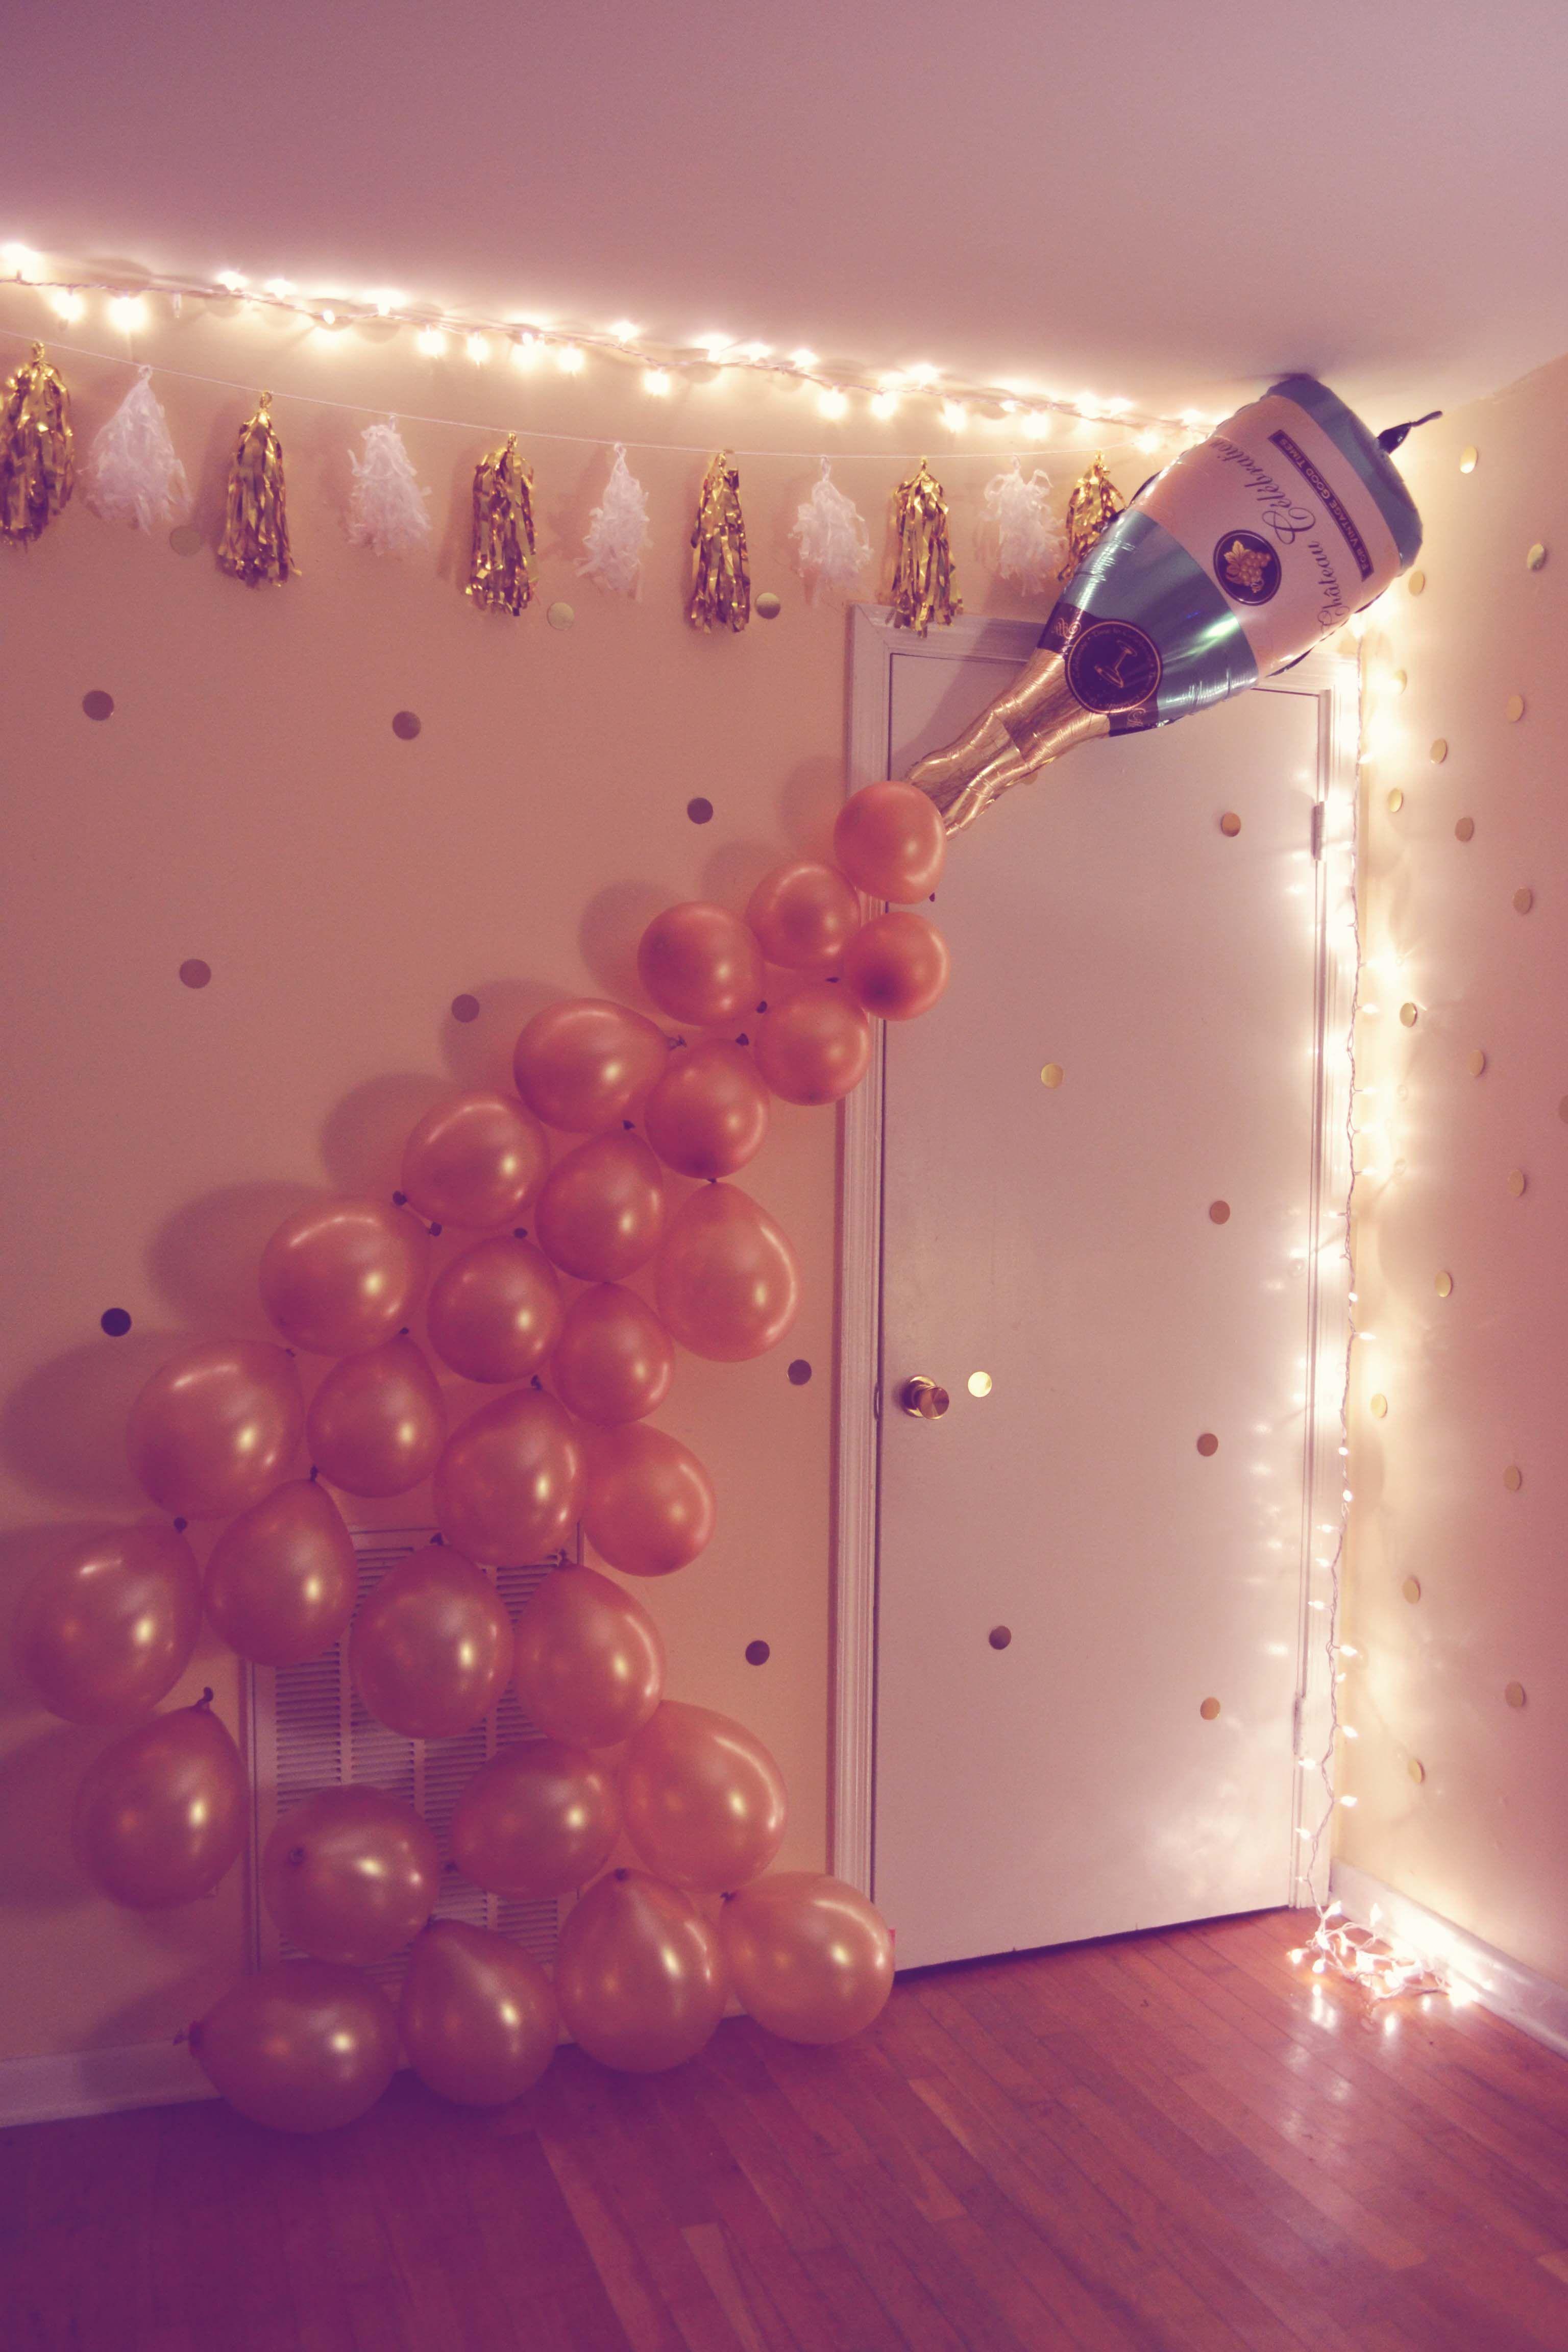 Bachelorette party balloons idea diy champagne balloon photo backdrop courtesy of just  virginia girl also sebastian in birthday st rh pinterest